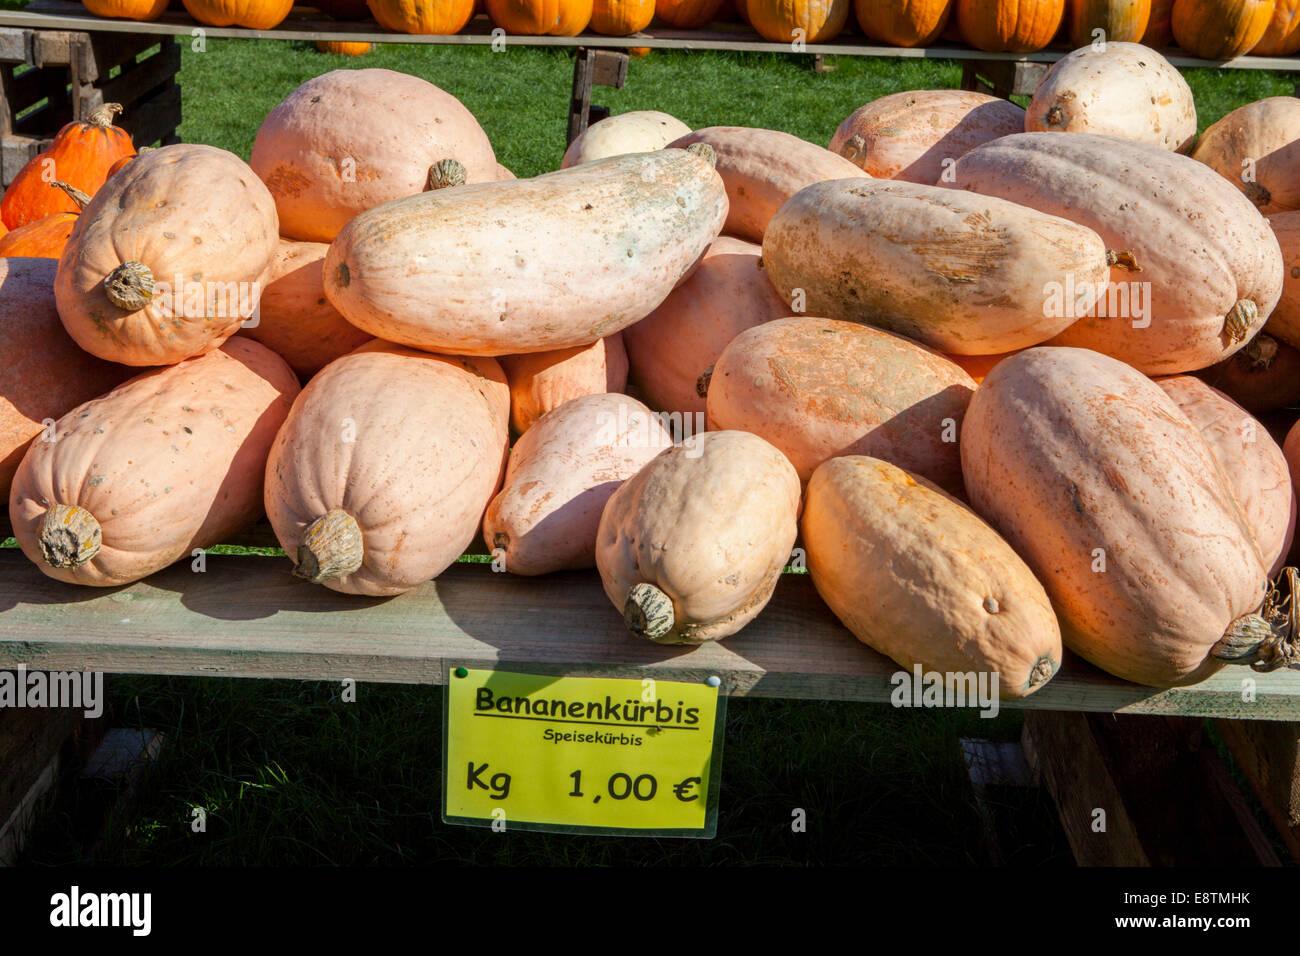 Squash de banane, Photo Stock